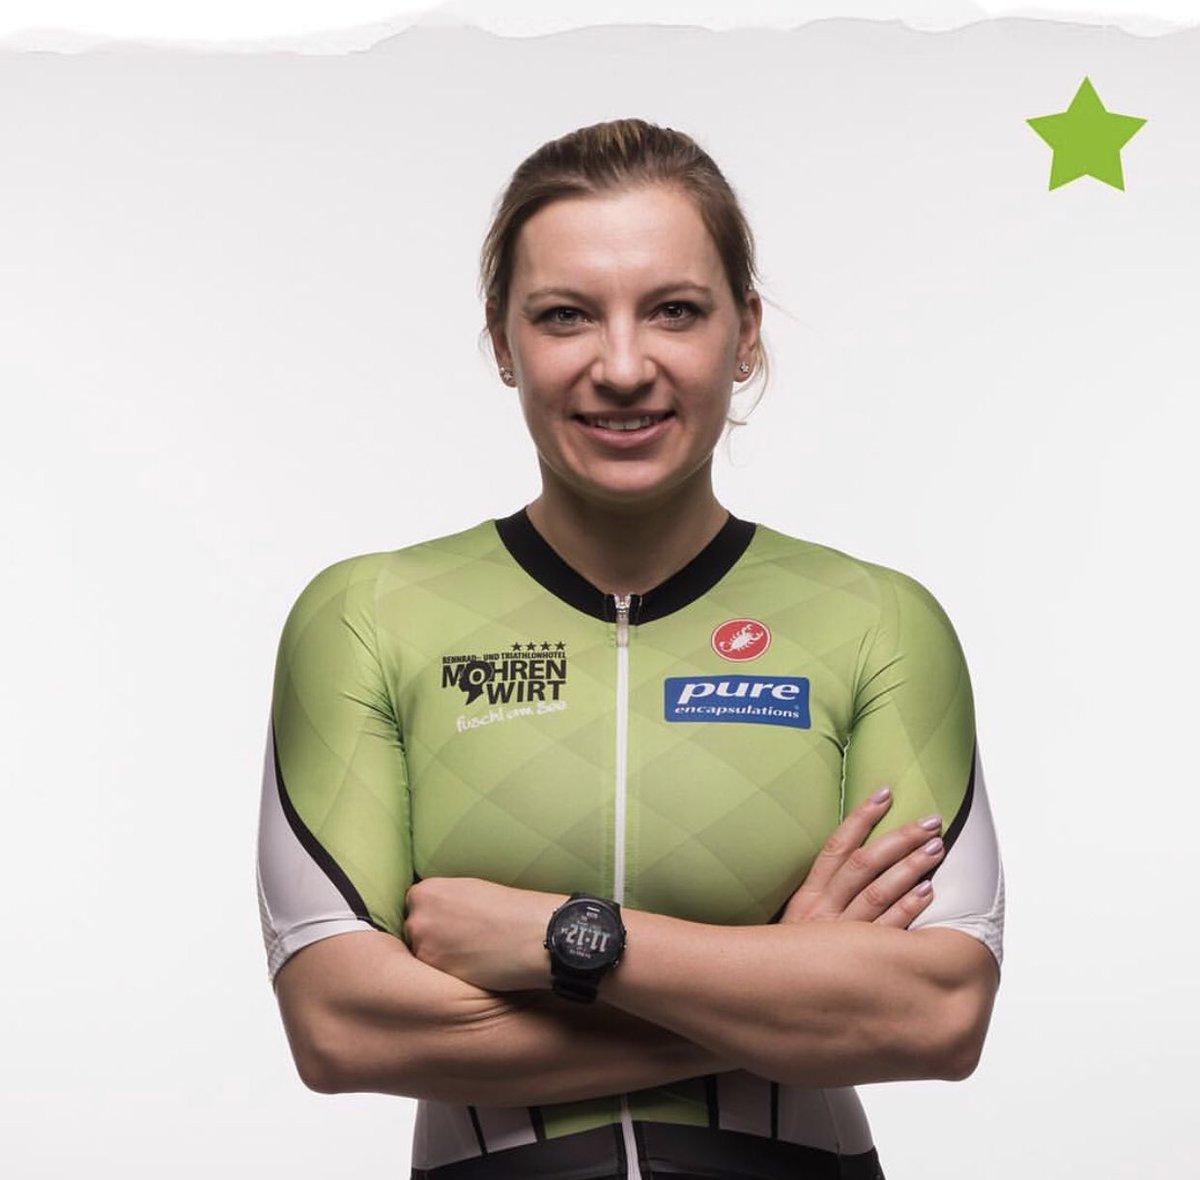 TOP 10👚 #IronmanItaly  8:48:23 Carolin Lehrieder 🇩🇪📸 8:56:39 Jenny Schulz 🇩🇪 9:02:12 Mareen Hufe 🇩🇪 9:04:40 Michelle Vesterby 🇩🇰 9:05:18 Joanna Ryter🇨🇭 . 📸 #teammohrenwirt  #imtrinews #IMItaly  #ironmanitaly #imcervia 🏊🏼♂️3.8km 🚴🏻♂️180 km🏃🏼♂️42.2km #ironmantri